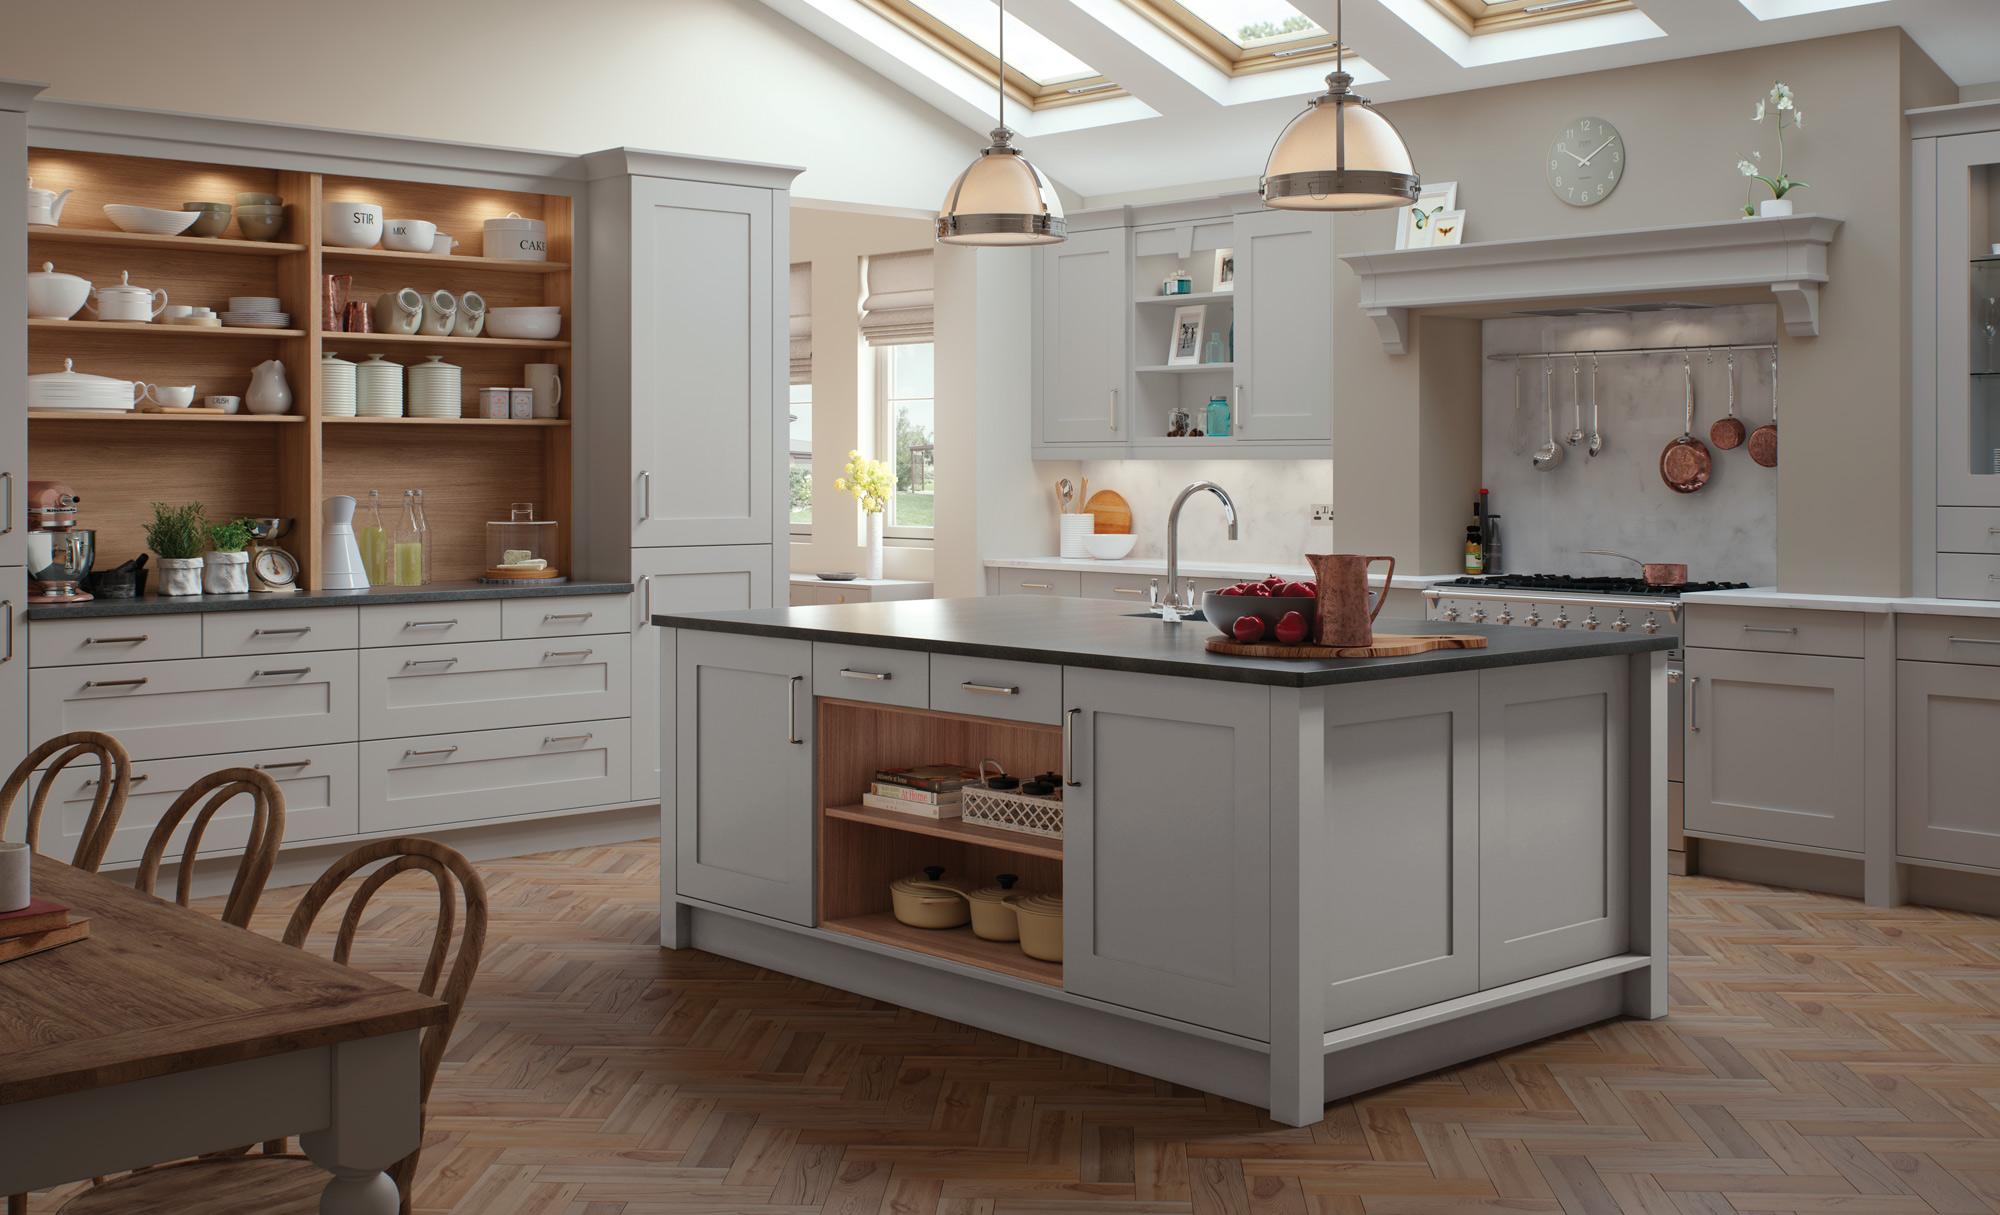 Best Kitchen Gallery: Georgia Modern Light Grey Kitchen Stori of Light Gray Kitchen Design on cal-ite.com